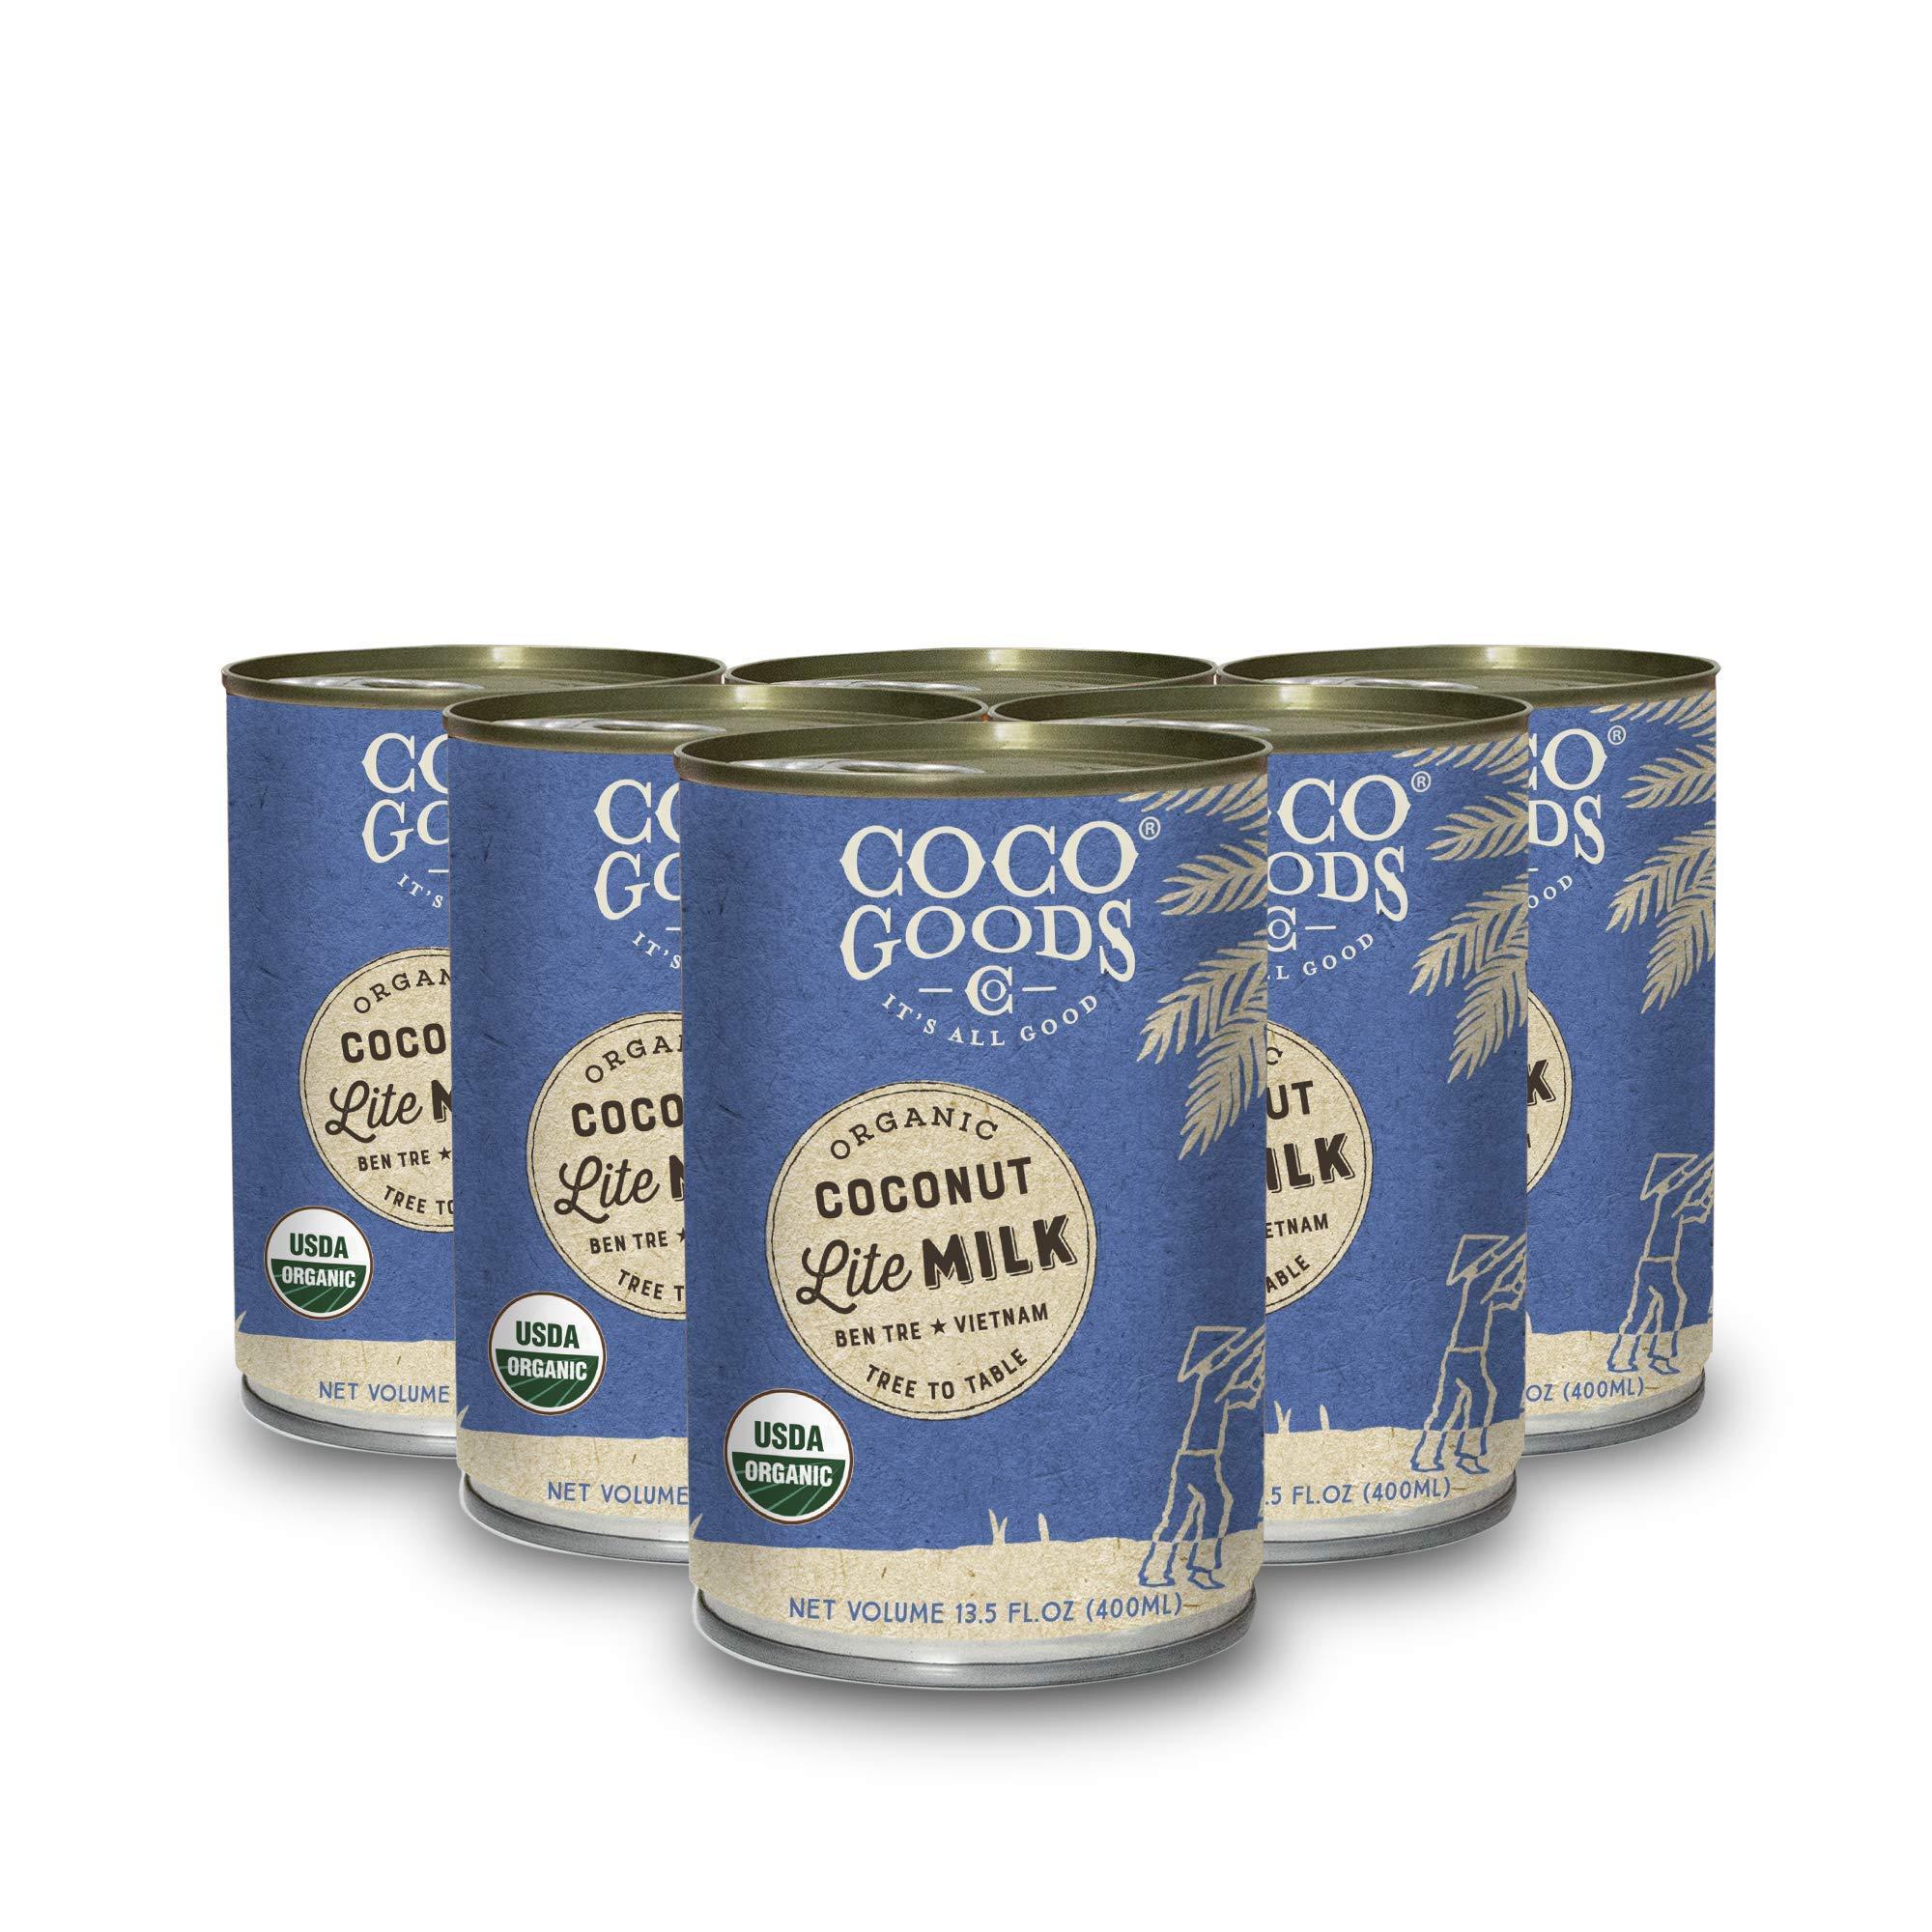 CocoGoodsCo Vietnam Single-Origin Organic Coconut Milk Lite/Light/Low-fat 13.5 fl. oz - Gluten-free, Non-GMO, Vegan, & Dairy-free (Pack of 6)